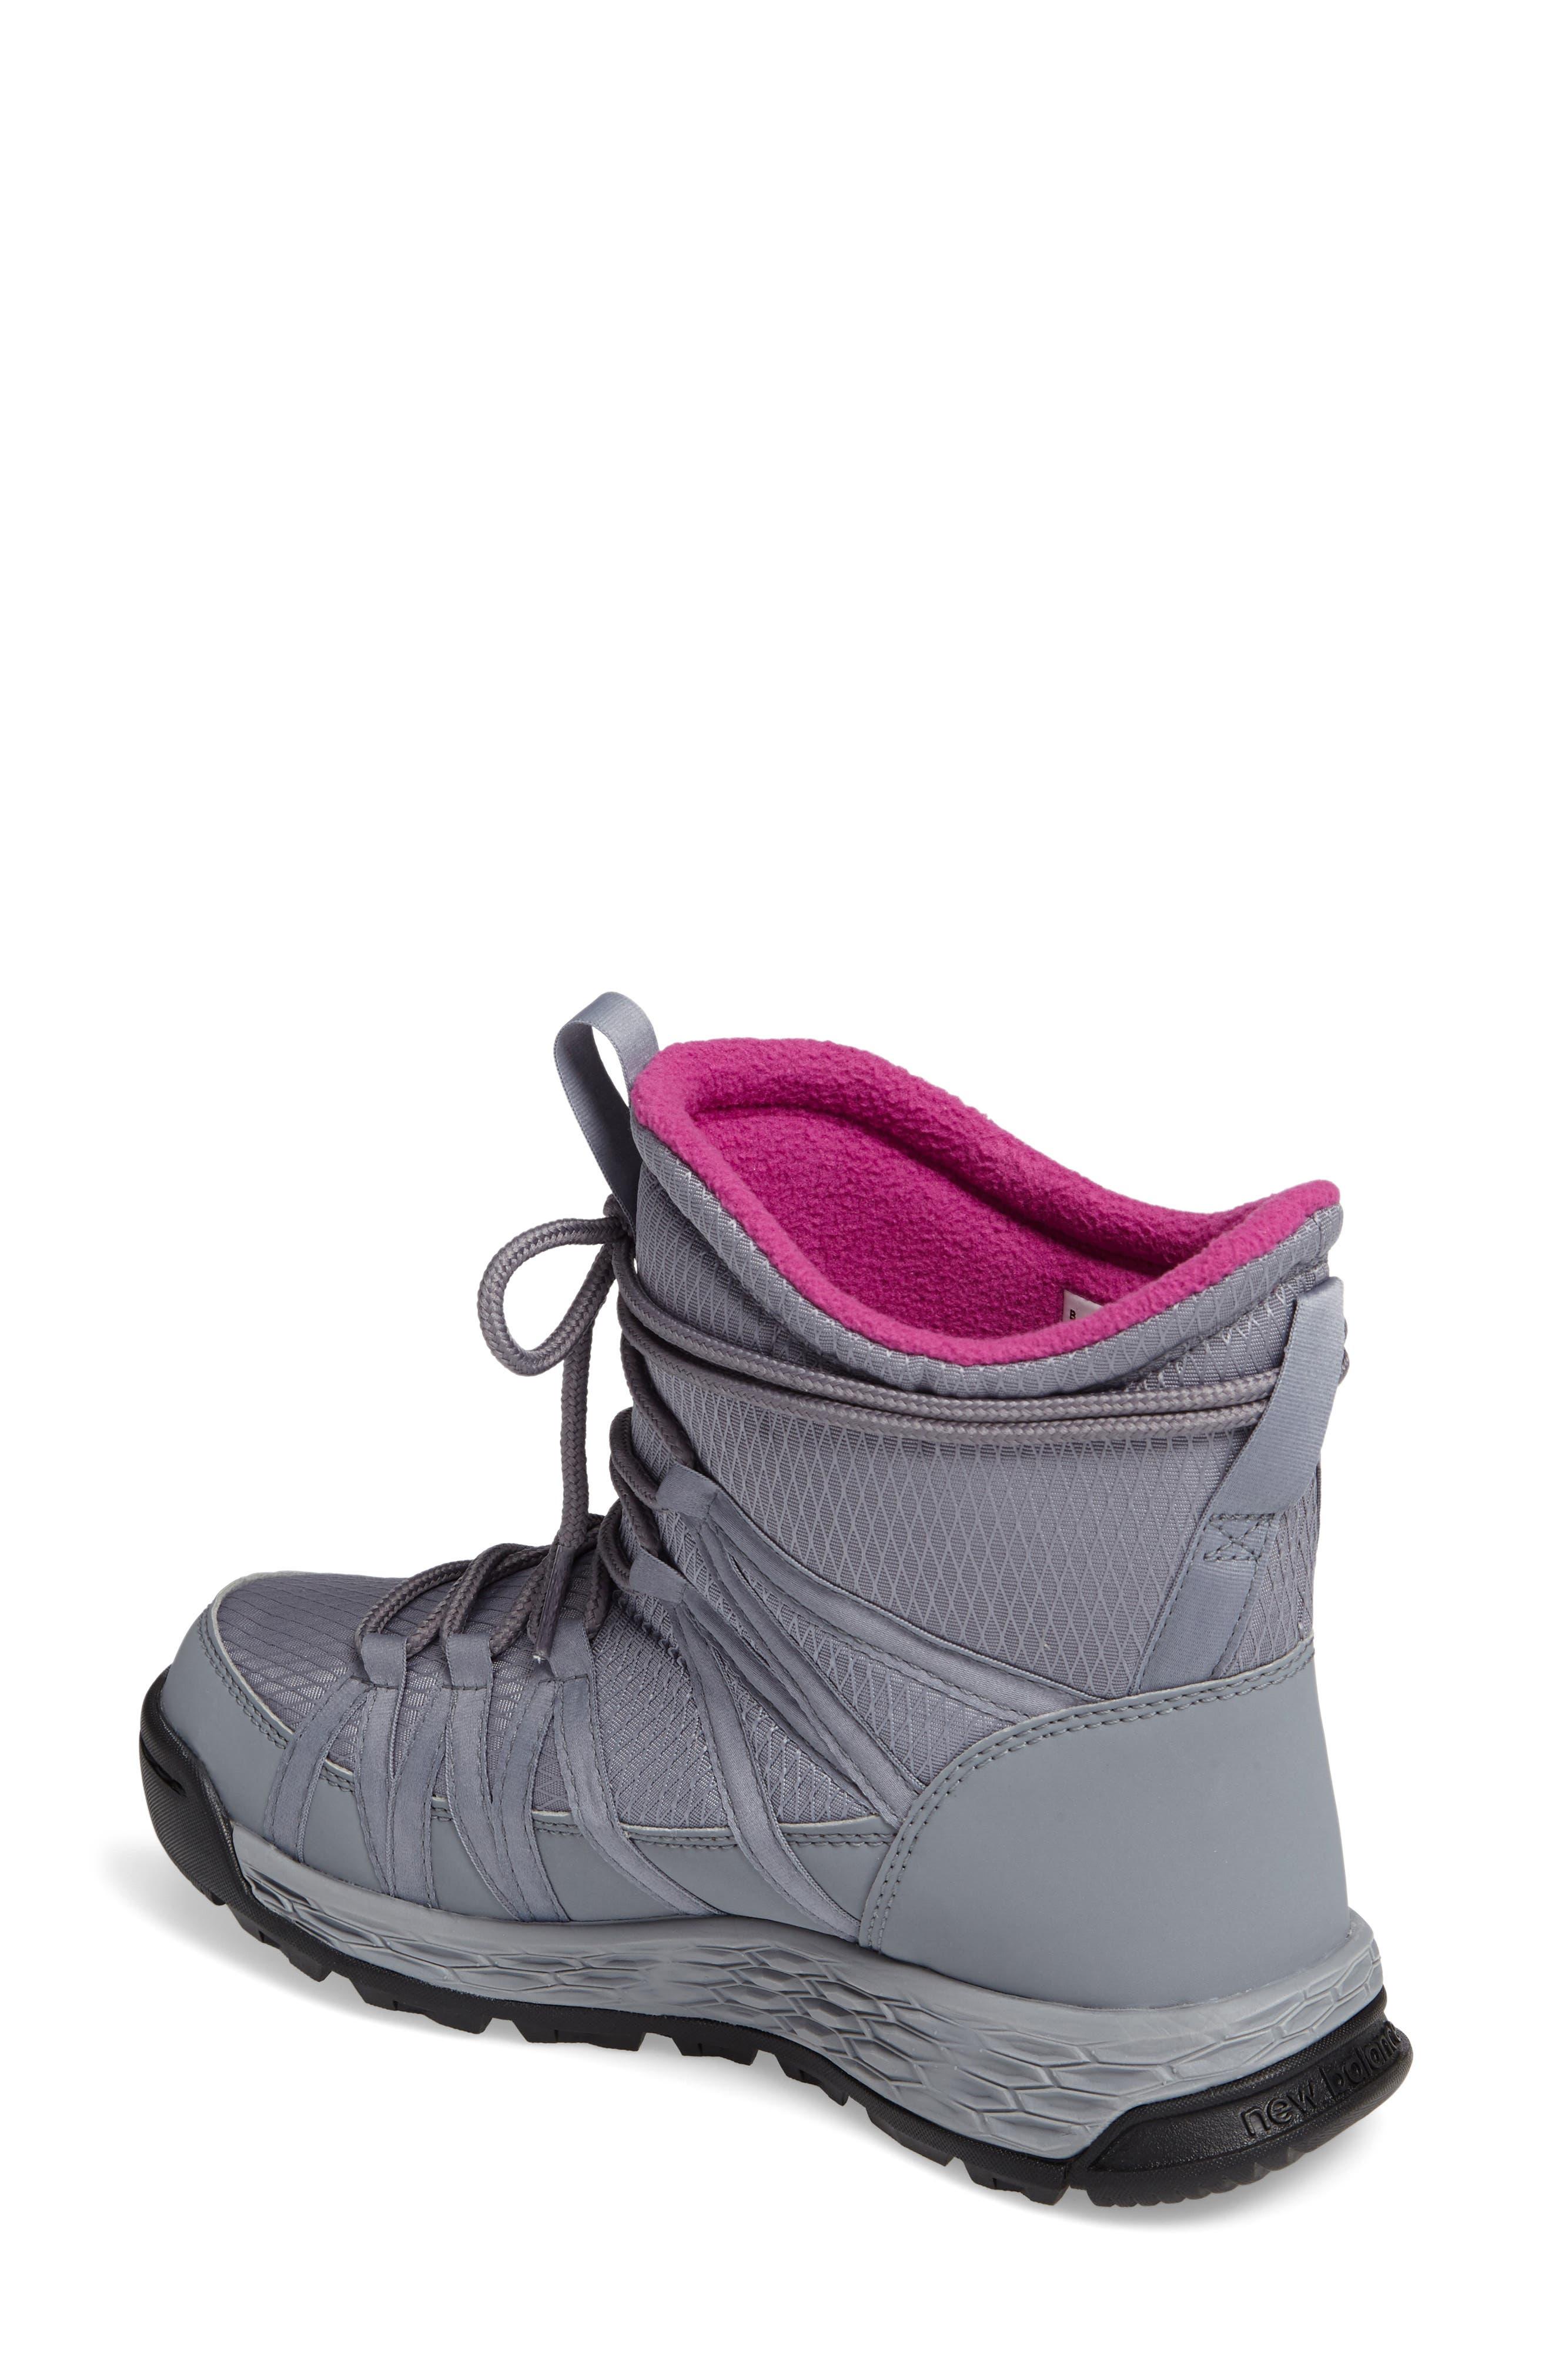 Q416 Weatherproof Snow Boot,                             Alternate thumbnail 8, color,